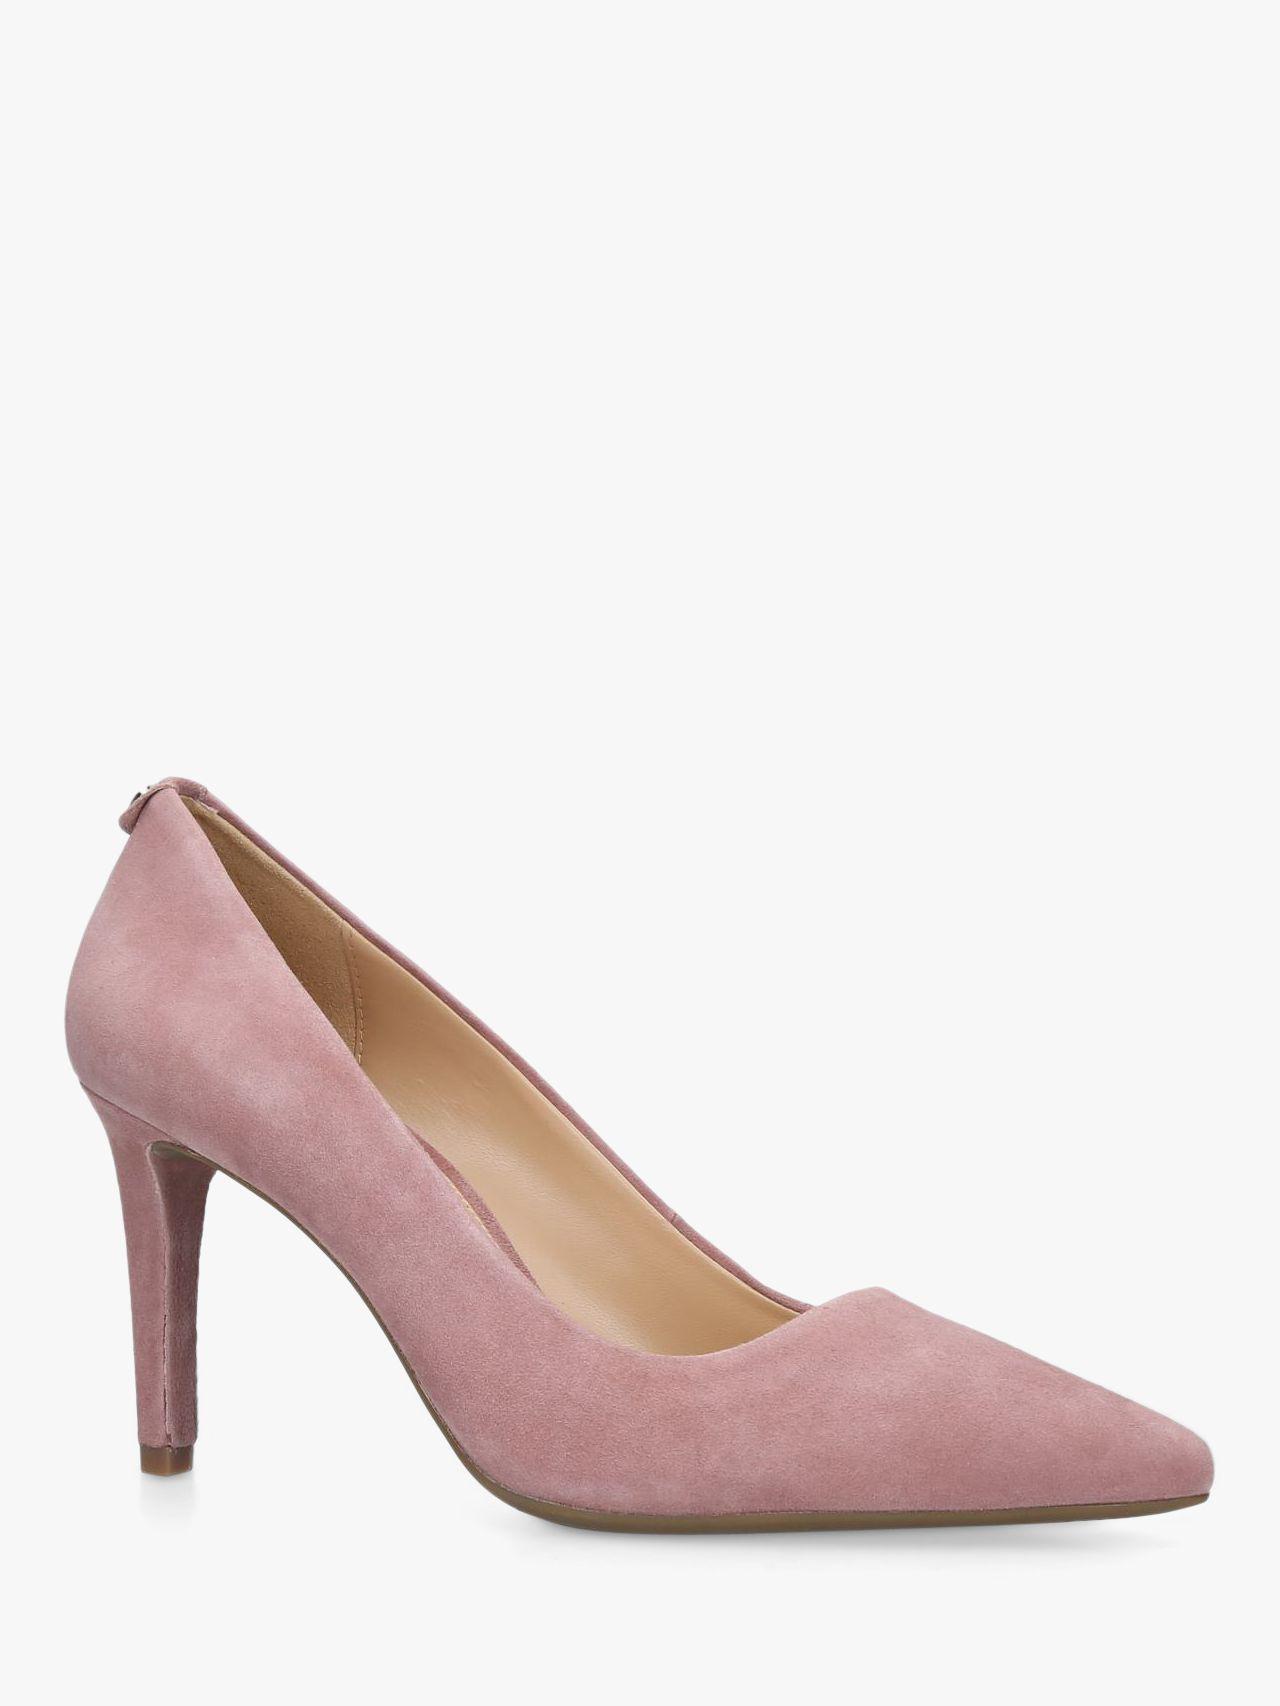 9776f33bfab Michael Kors - Pink Flex Pump Heeled Court Shoes - Lyst. View fullscreen